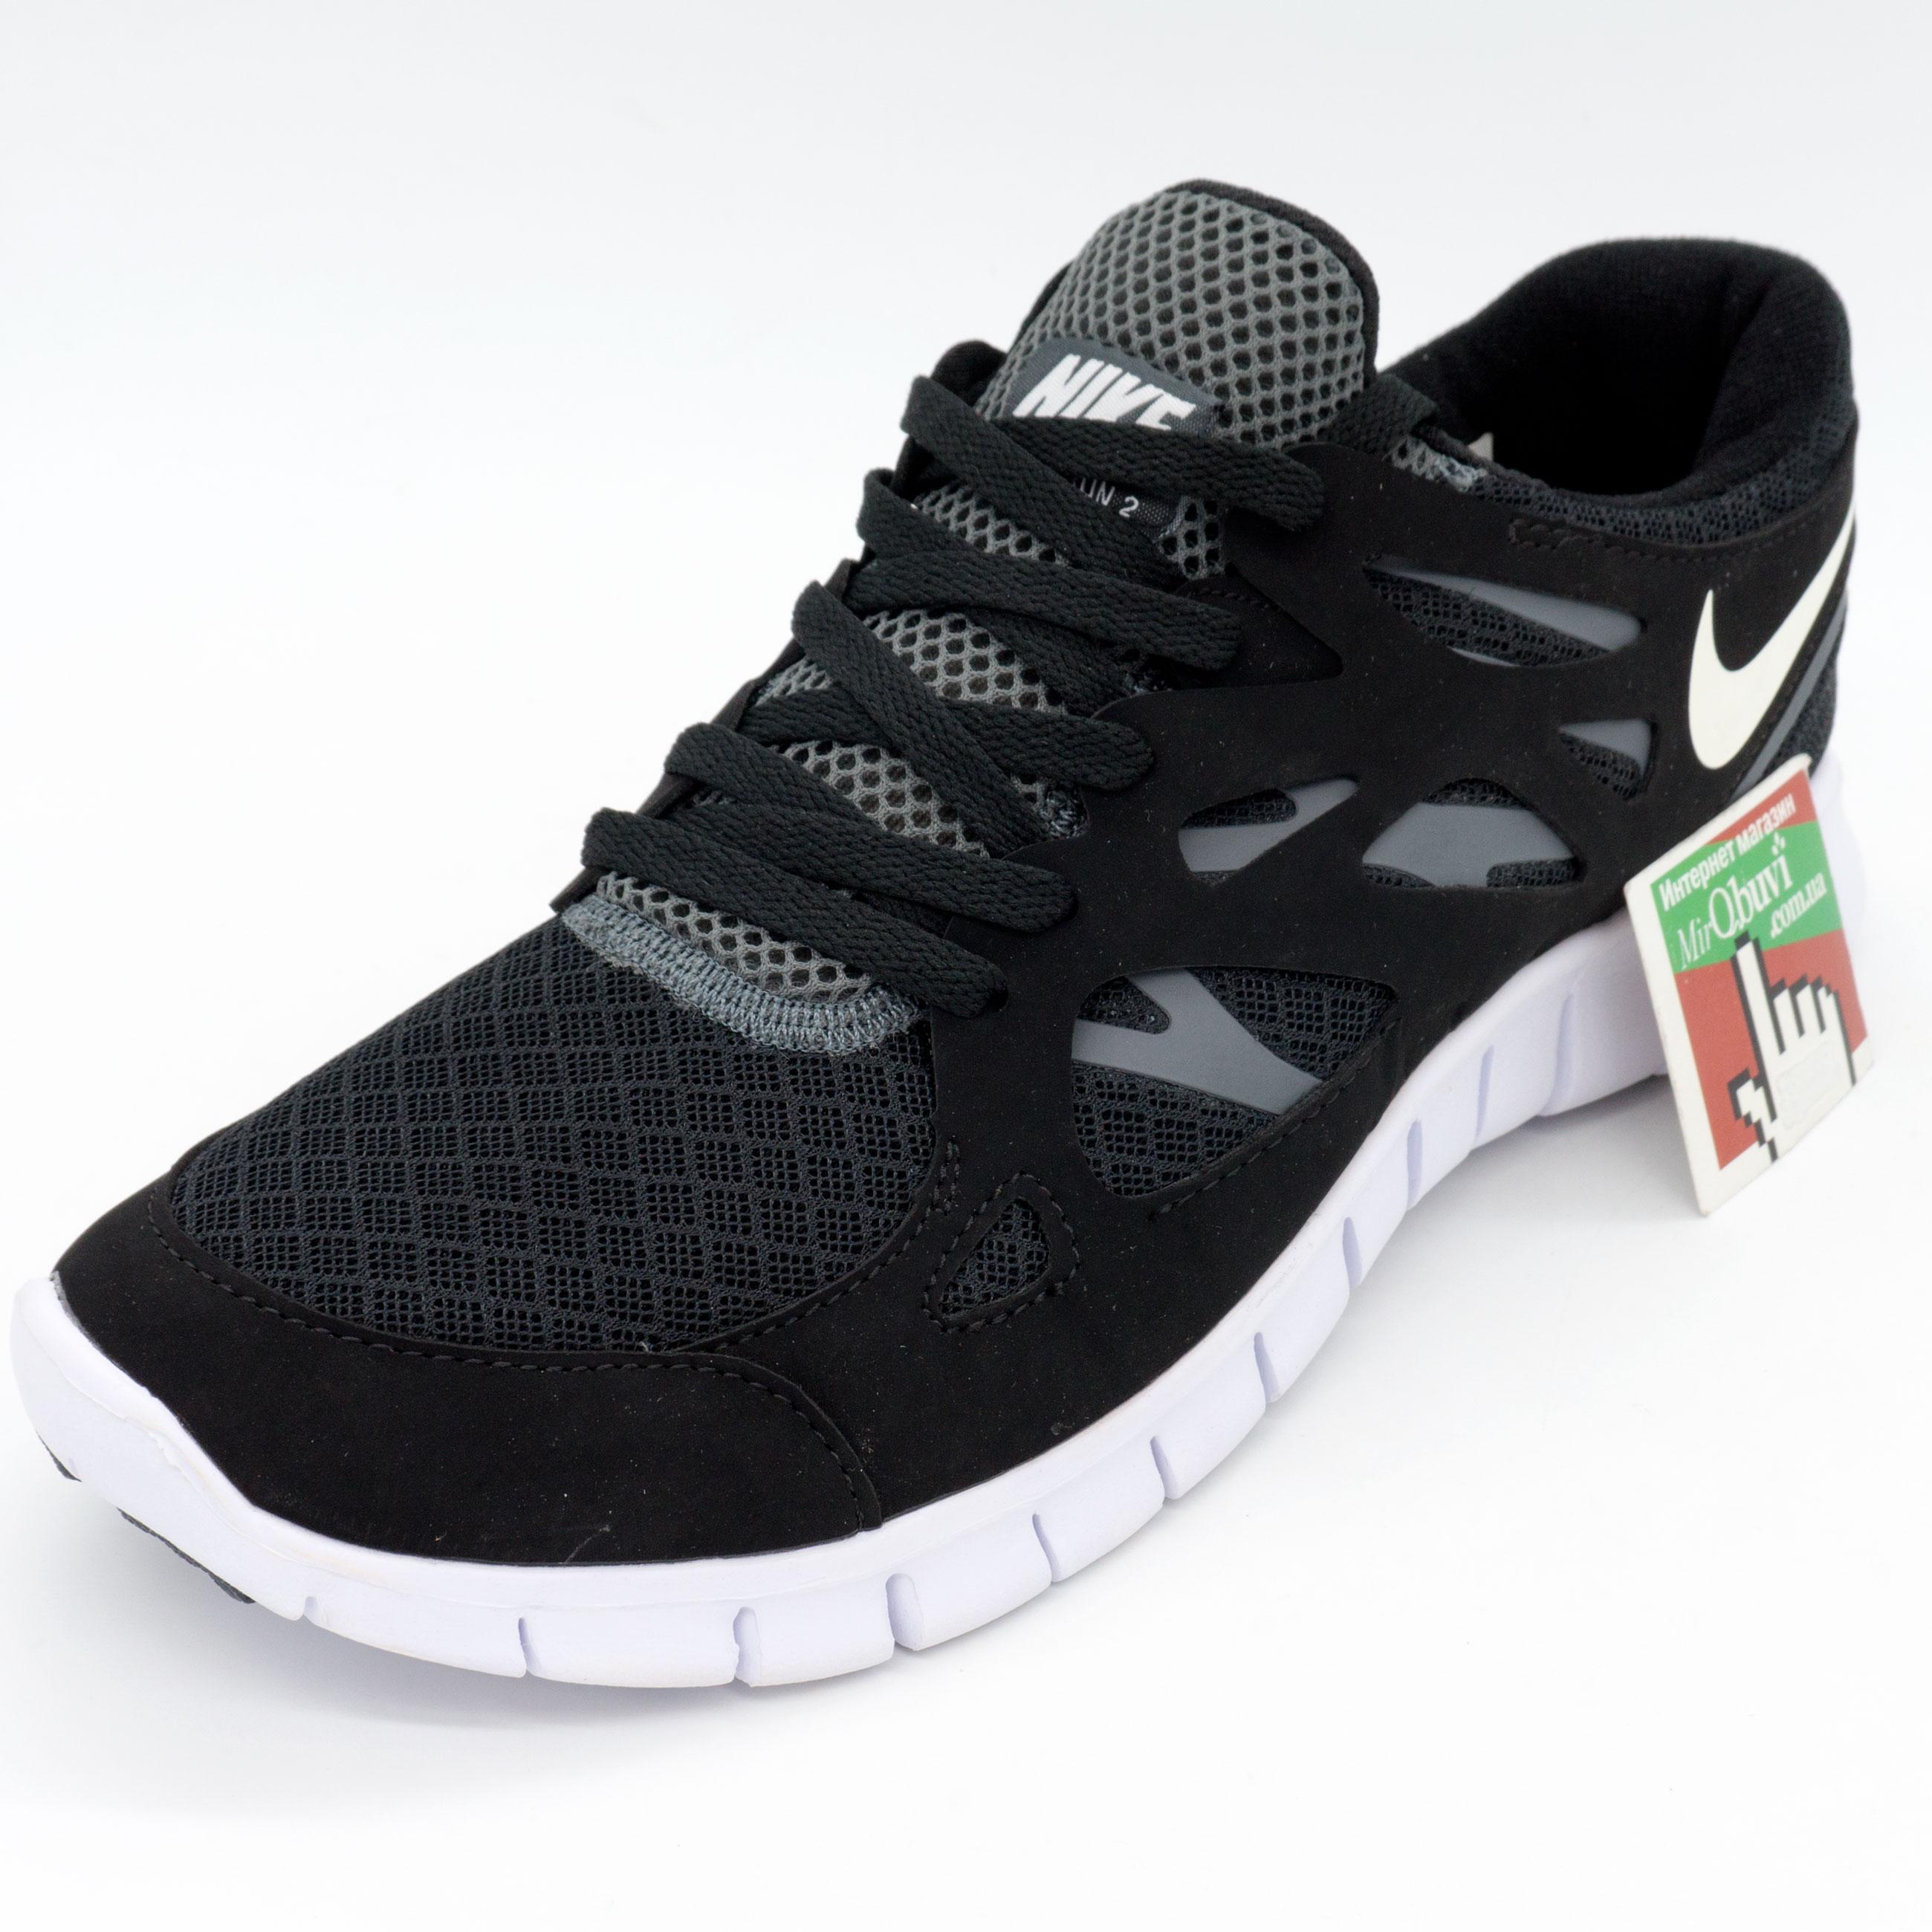 фото front Кроссовки для бега Nike Free Run 2 Найк Фри Ран, черно-белые front